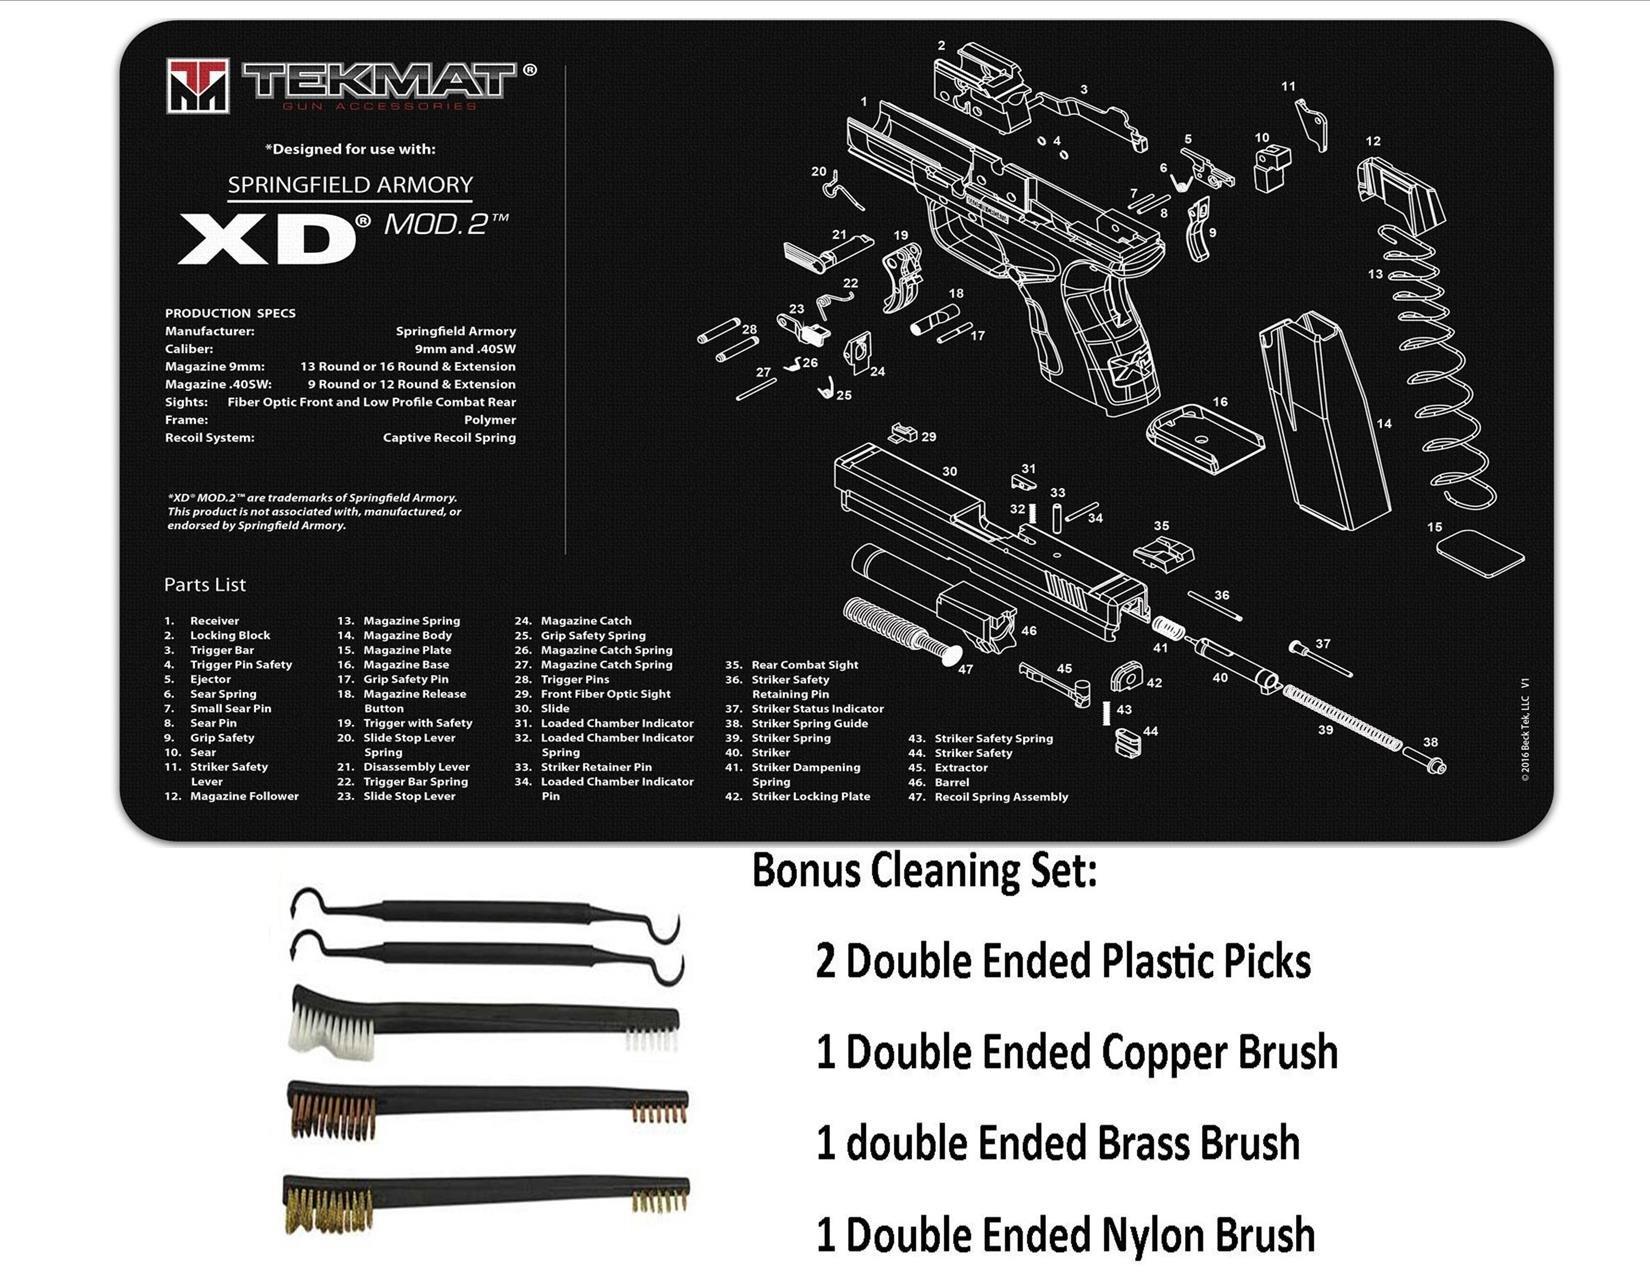 TekMat 11-Inch X 17-Inch Handgun Cleaning Mat with Springfield Armory XD Mod 2 Bonus 5 oc Gun Cleaning Brush & Pick Set